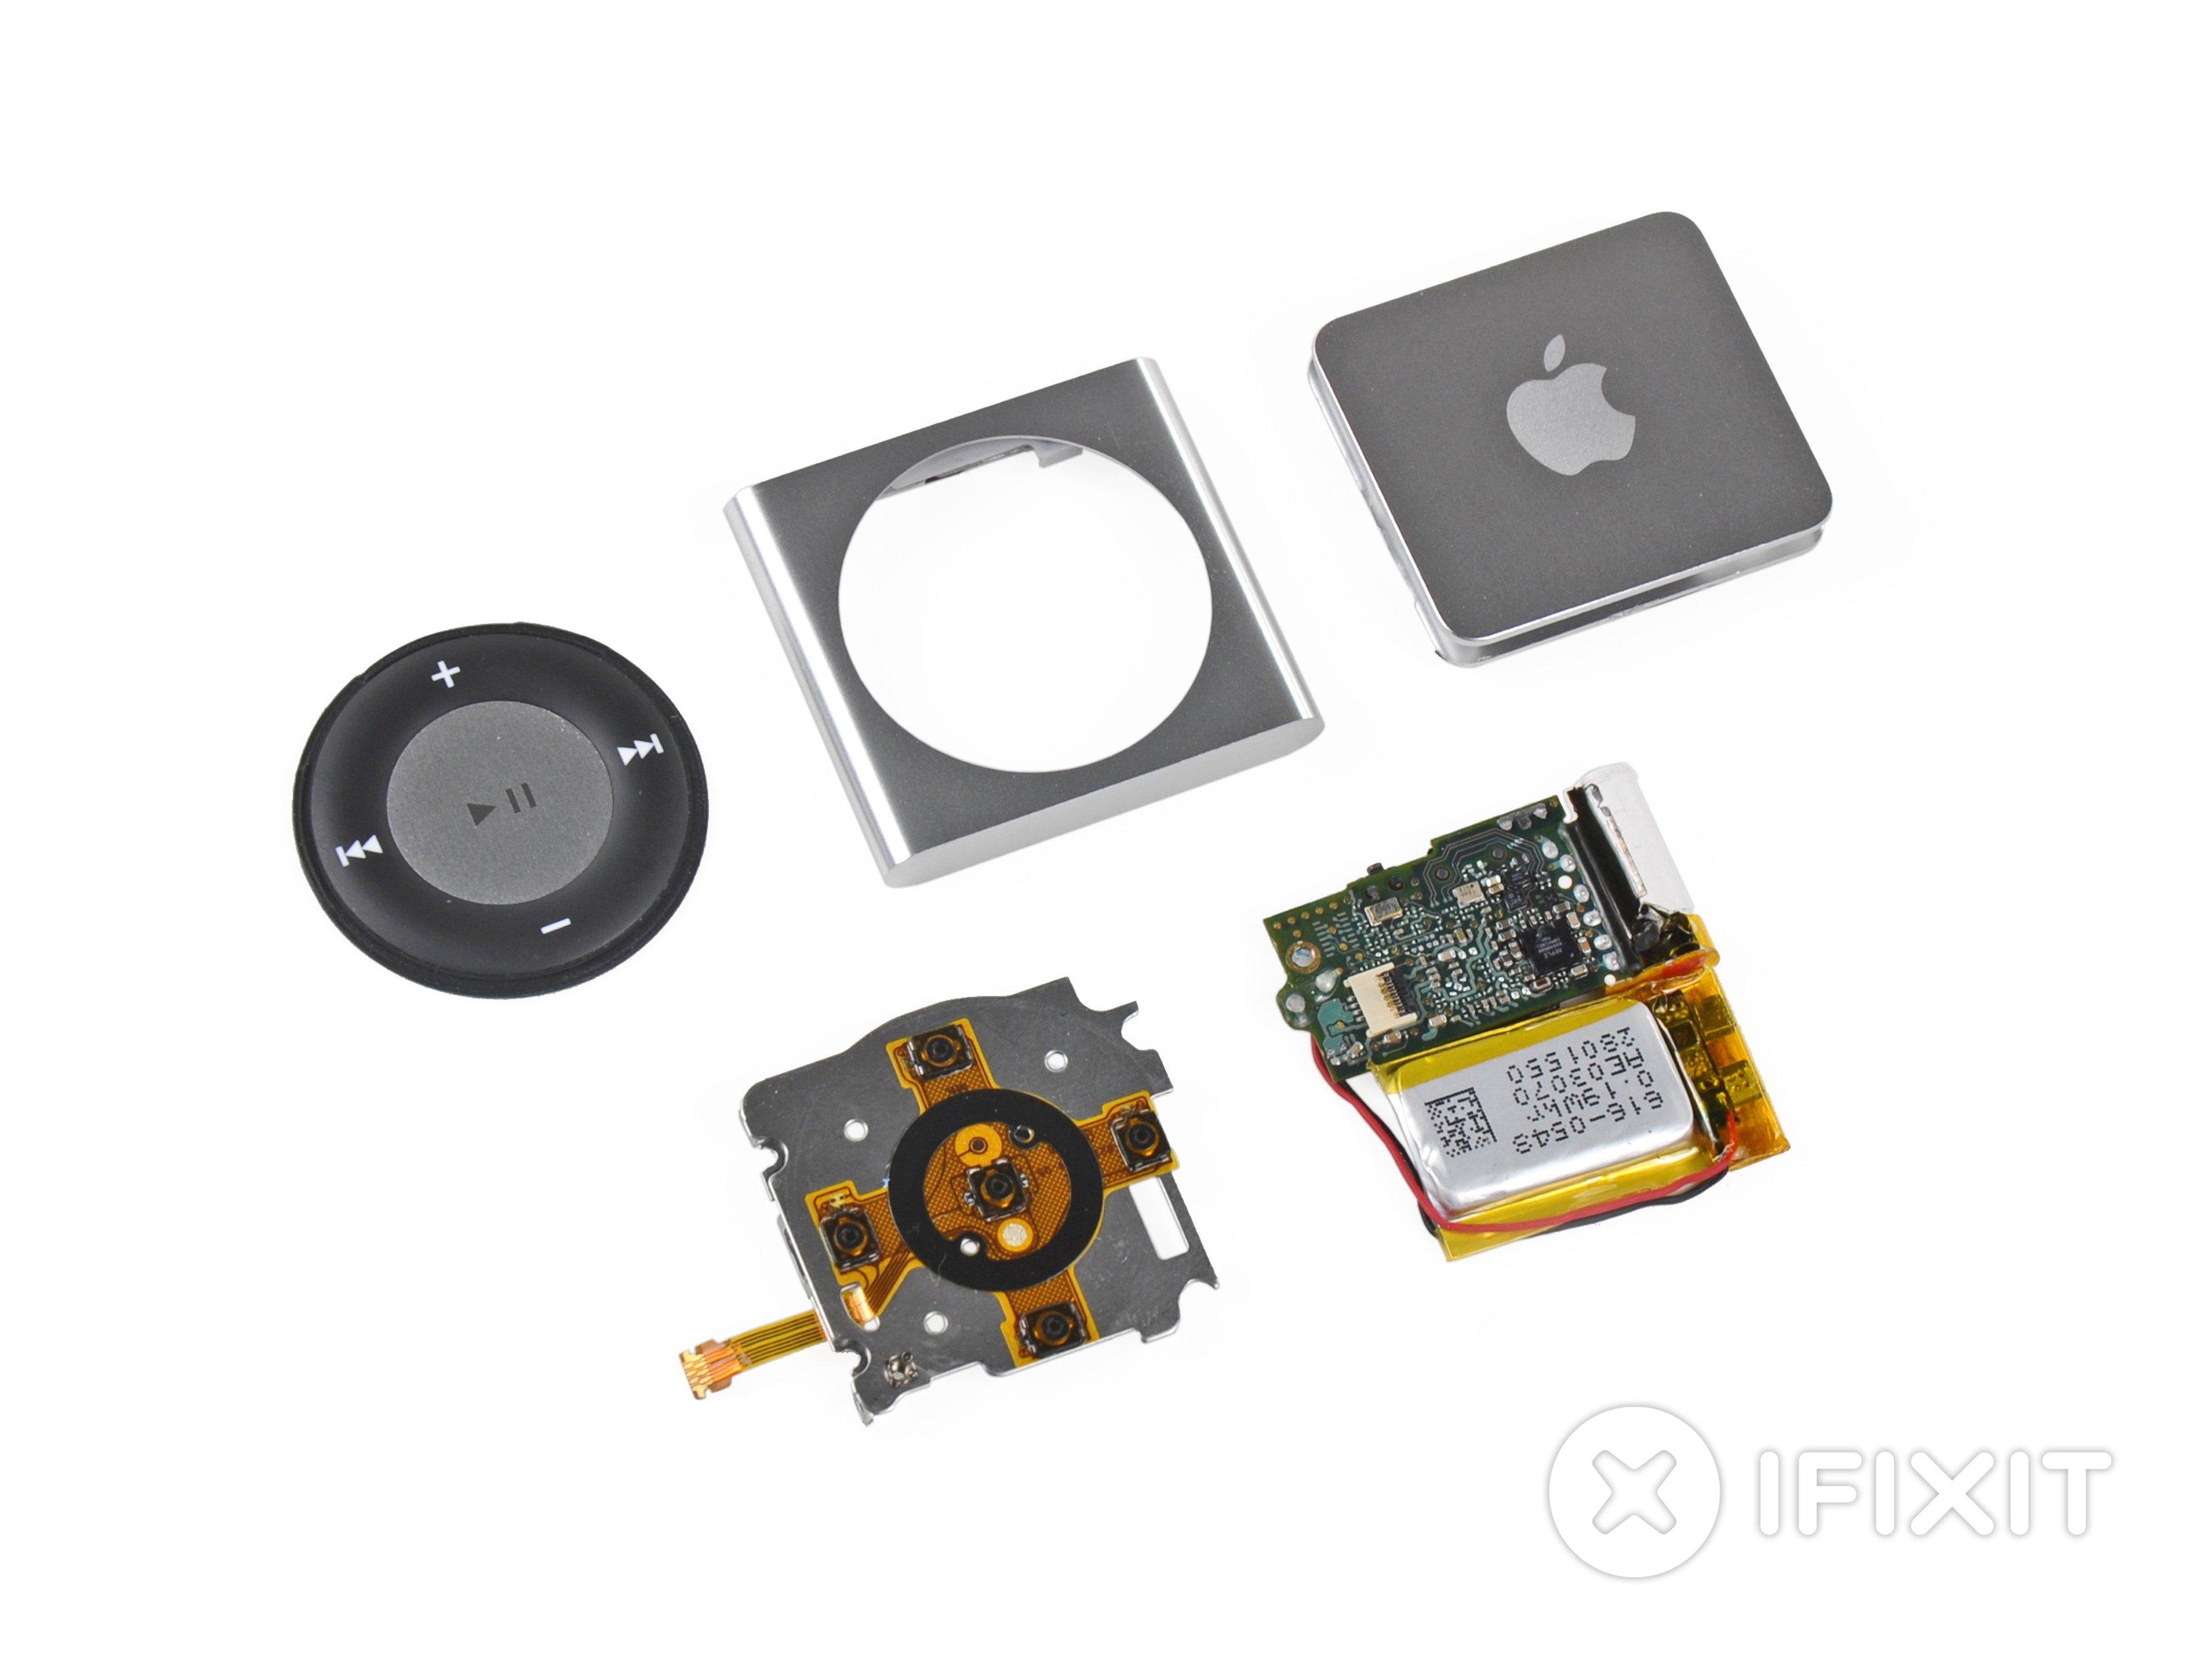 iPod Shuffle 4th Generation Teardown - iFixit